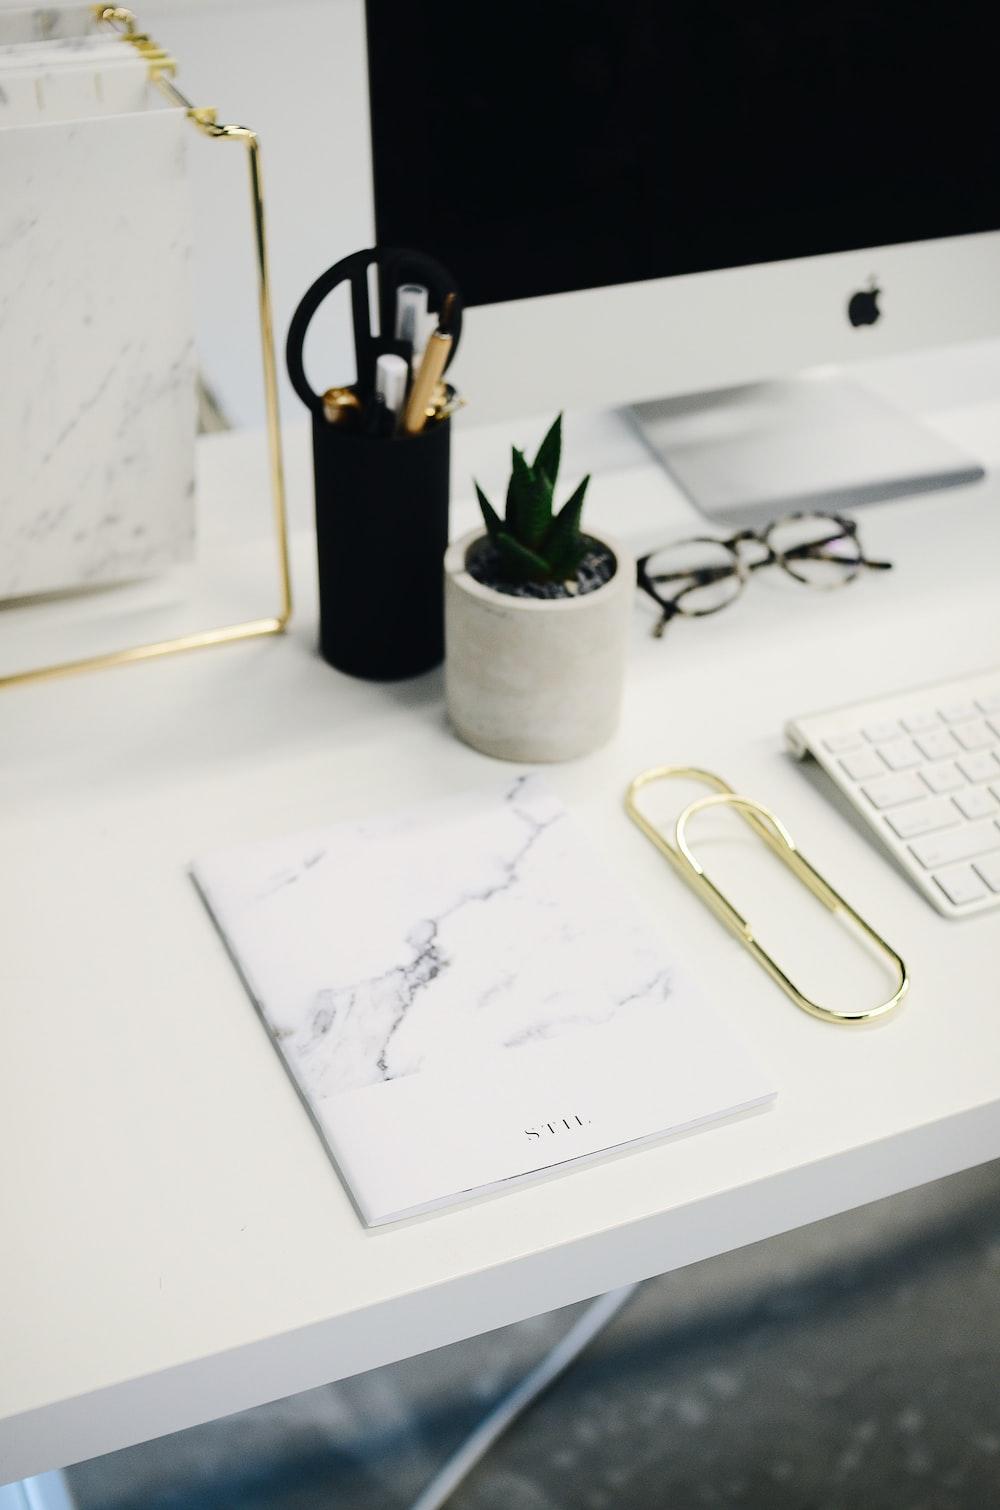 silver iMac and Magic Keyboard on ta ble near white printer paper